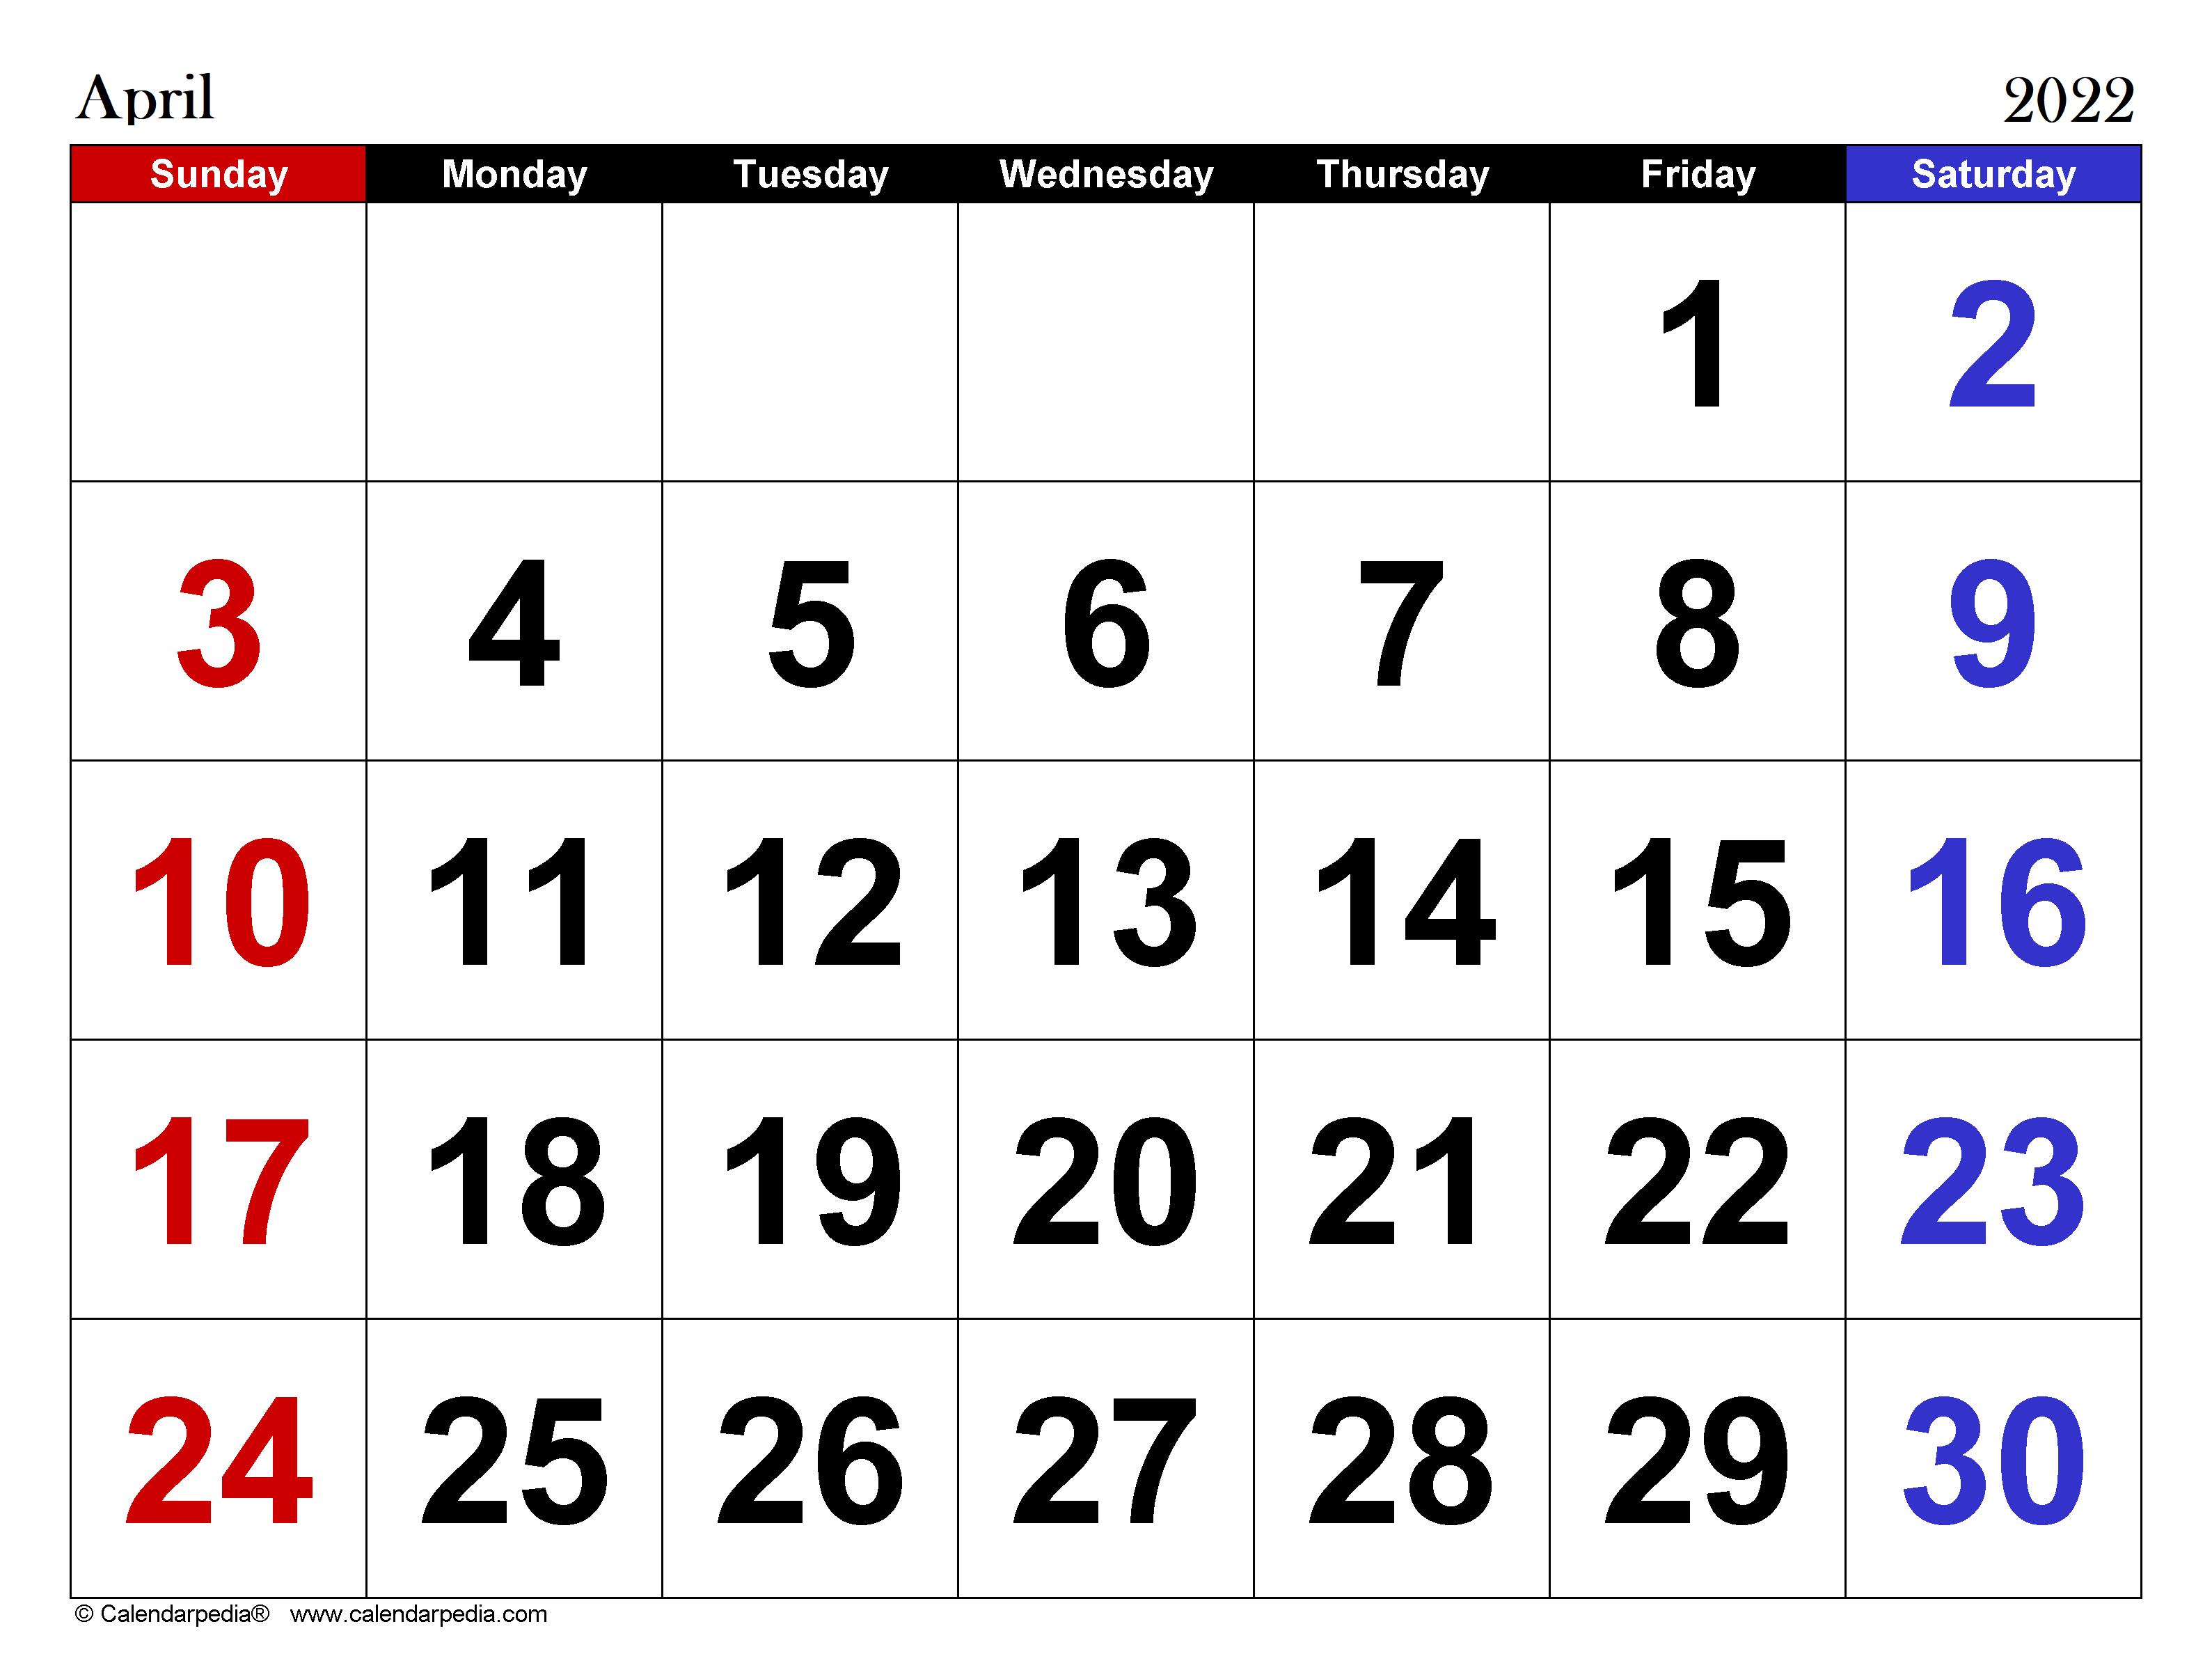 april-2022-calendar-for-summer-Vacation